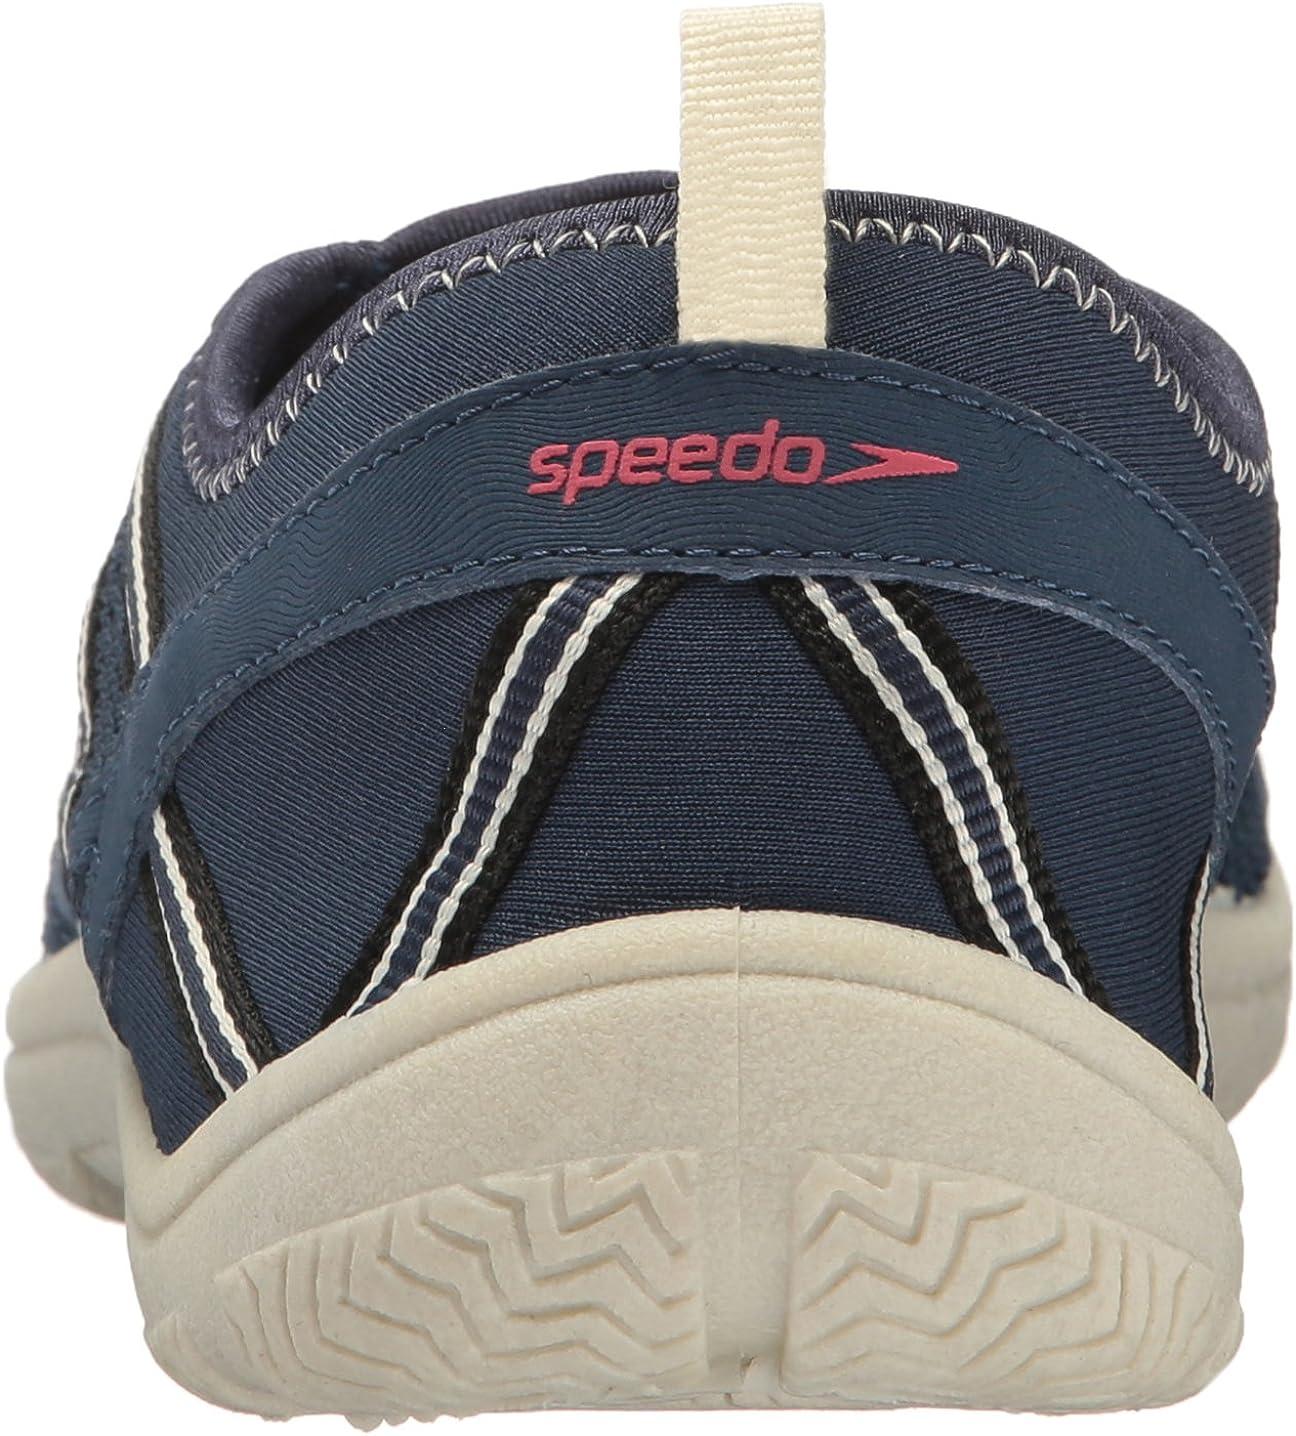 Speedo Mens Seaside Lace 5.0 Athletic Water Shoe